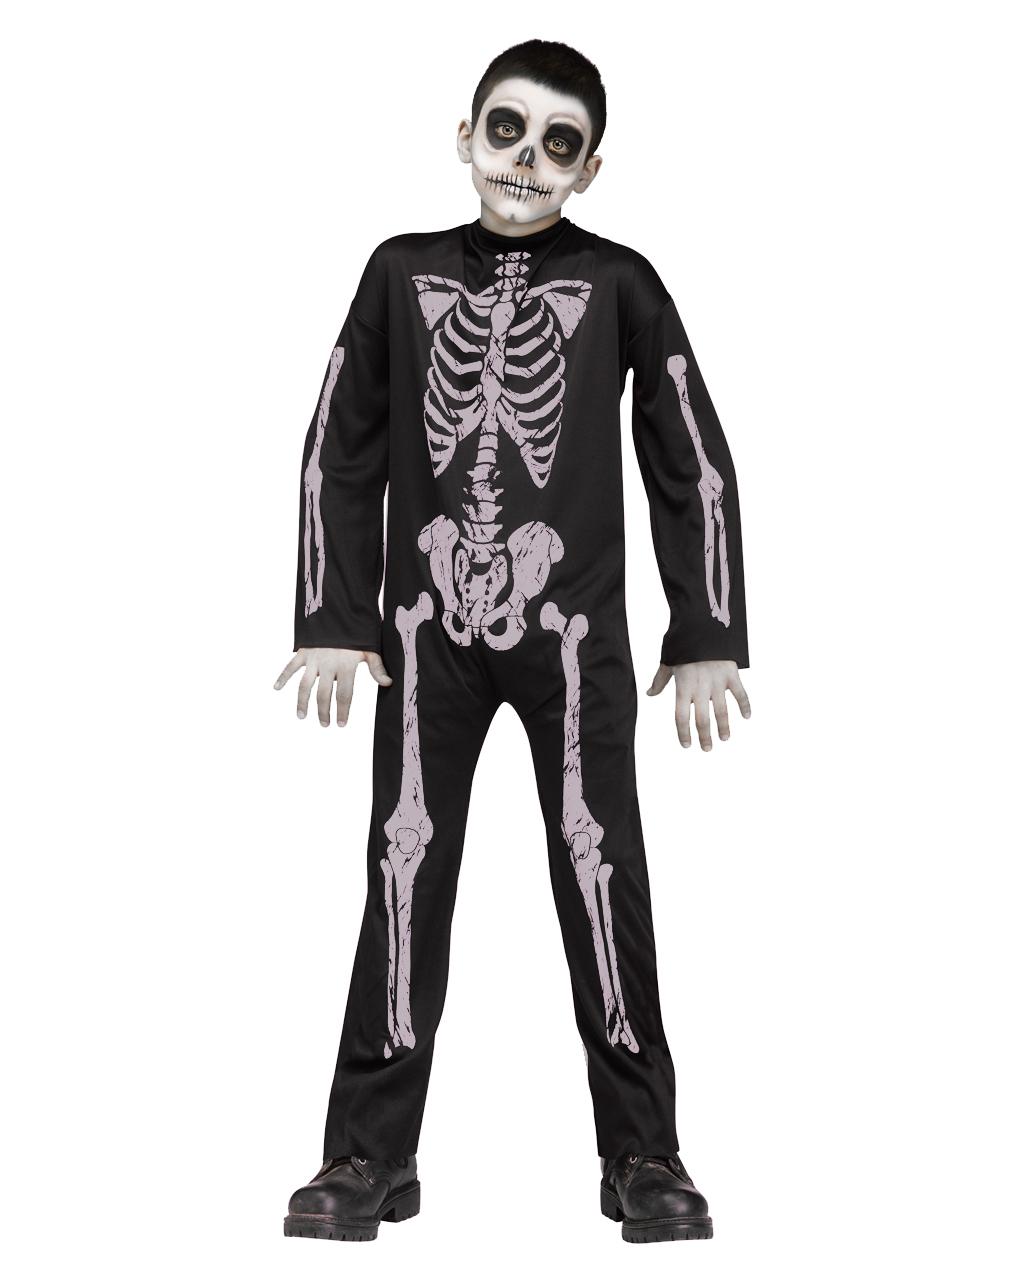 Skelett Halloween Kostüm Genial Skelett Kinder Kostüm Jumpsuit Für Halloweenpartys